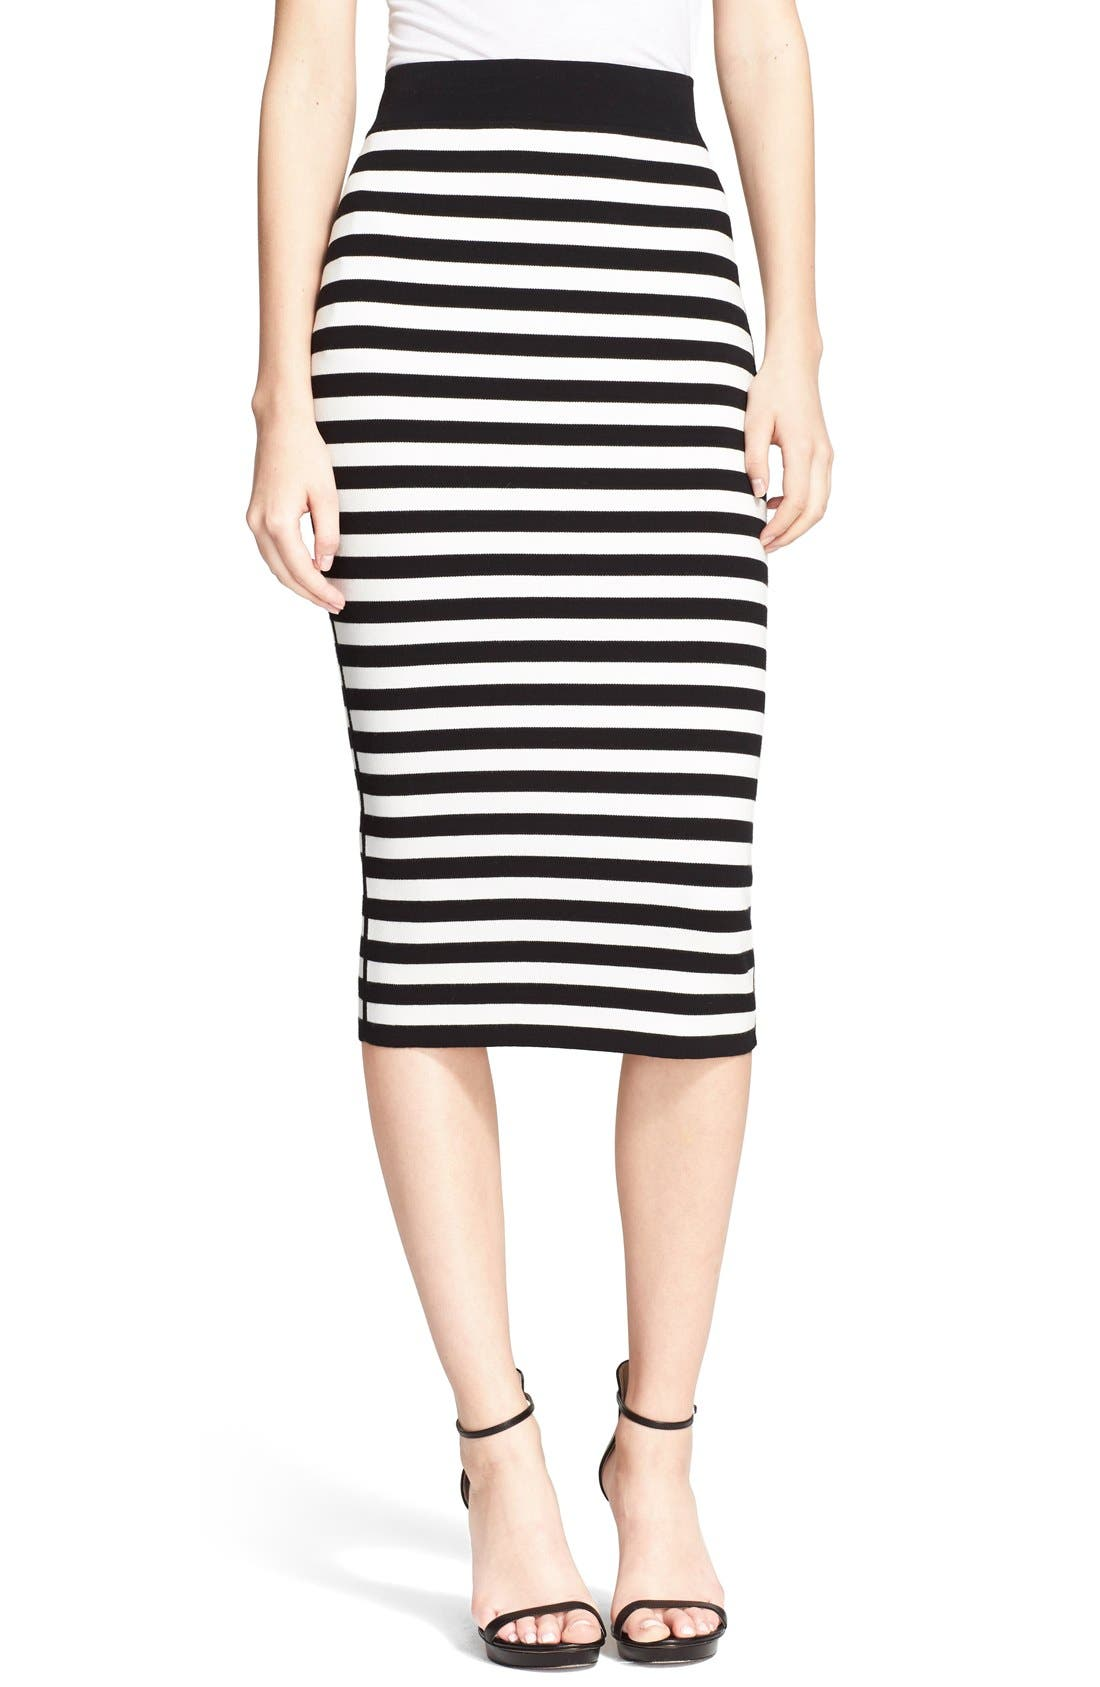 Alternate Image 1 Selected - Michael Kors Stripe Knit Pencil Skirt